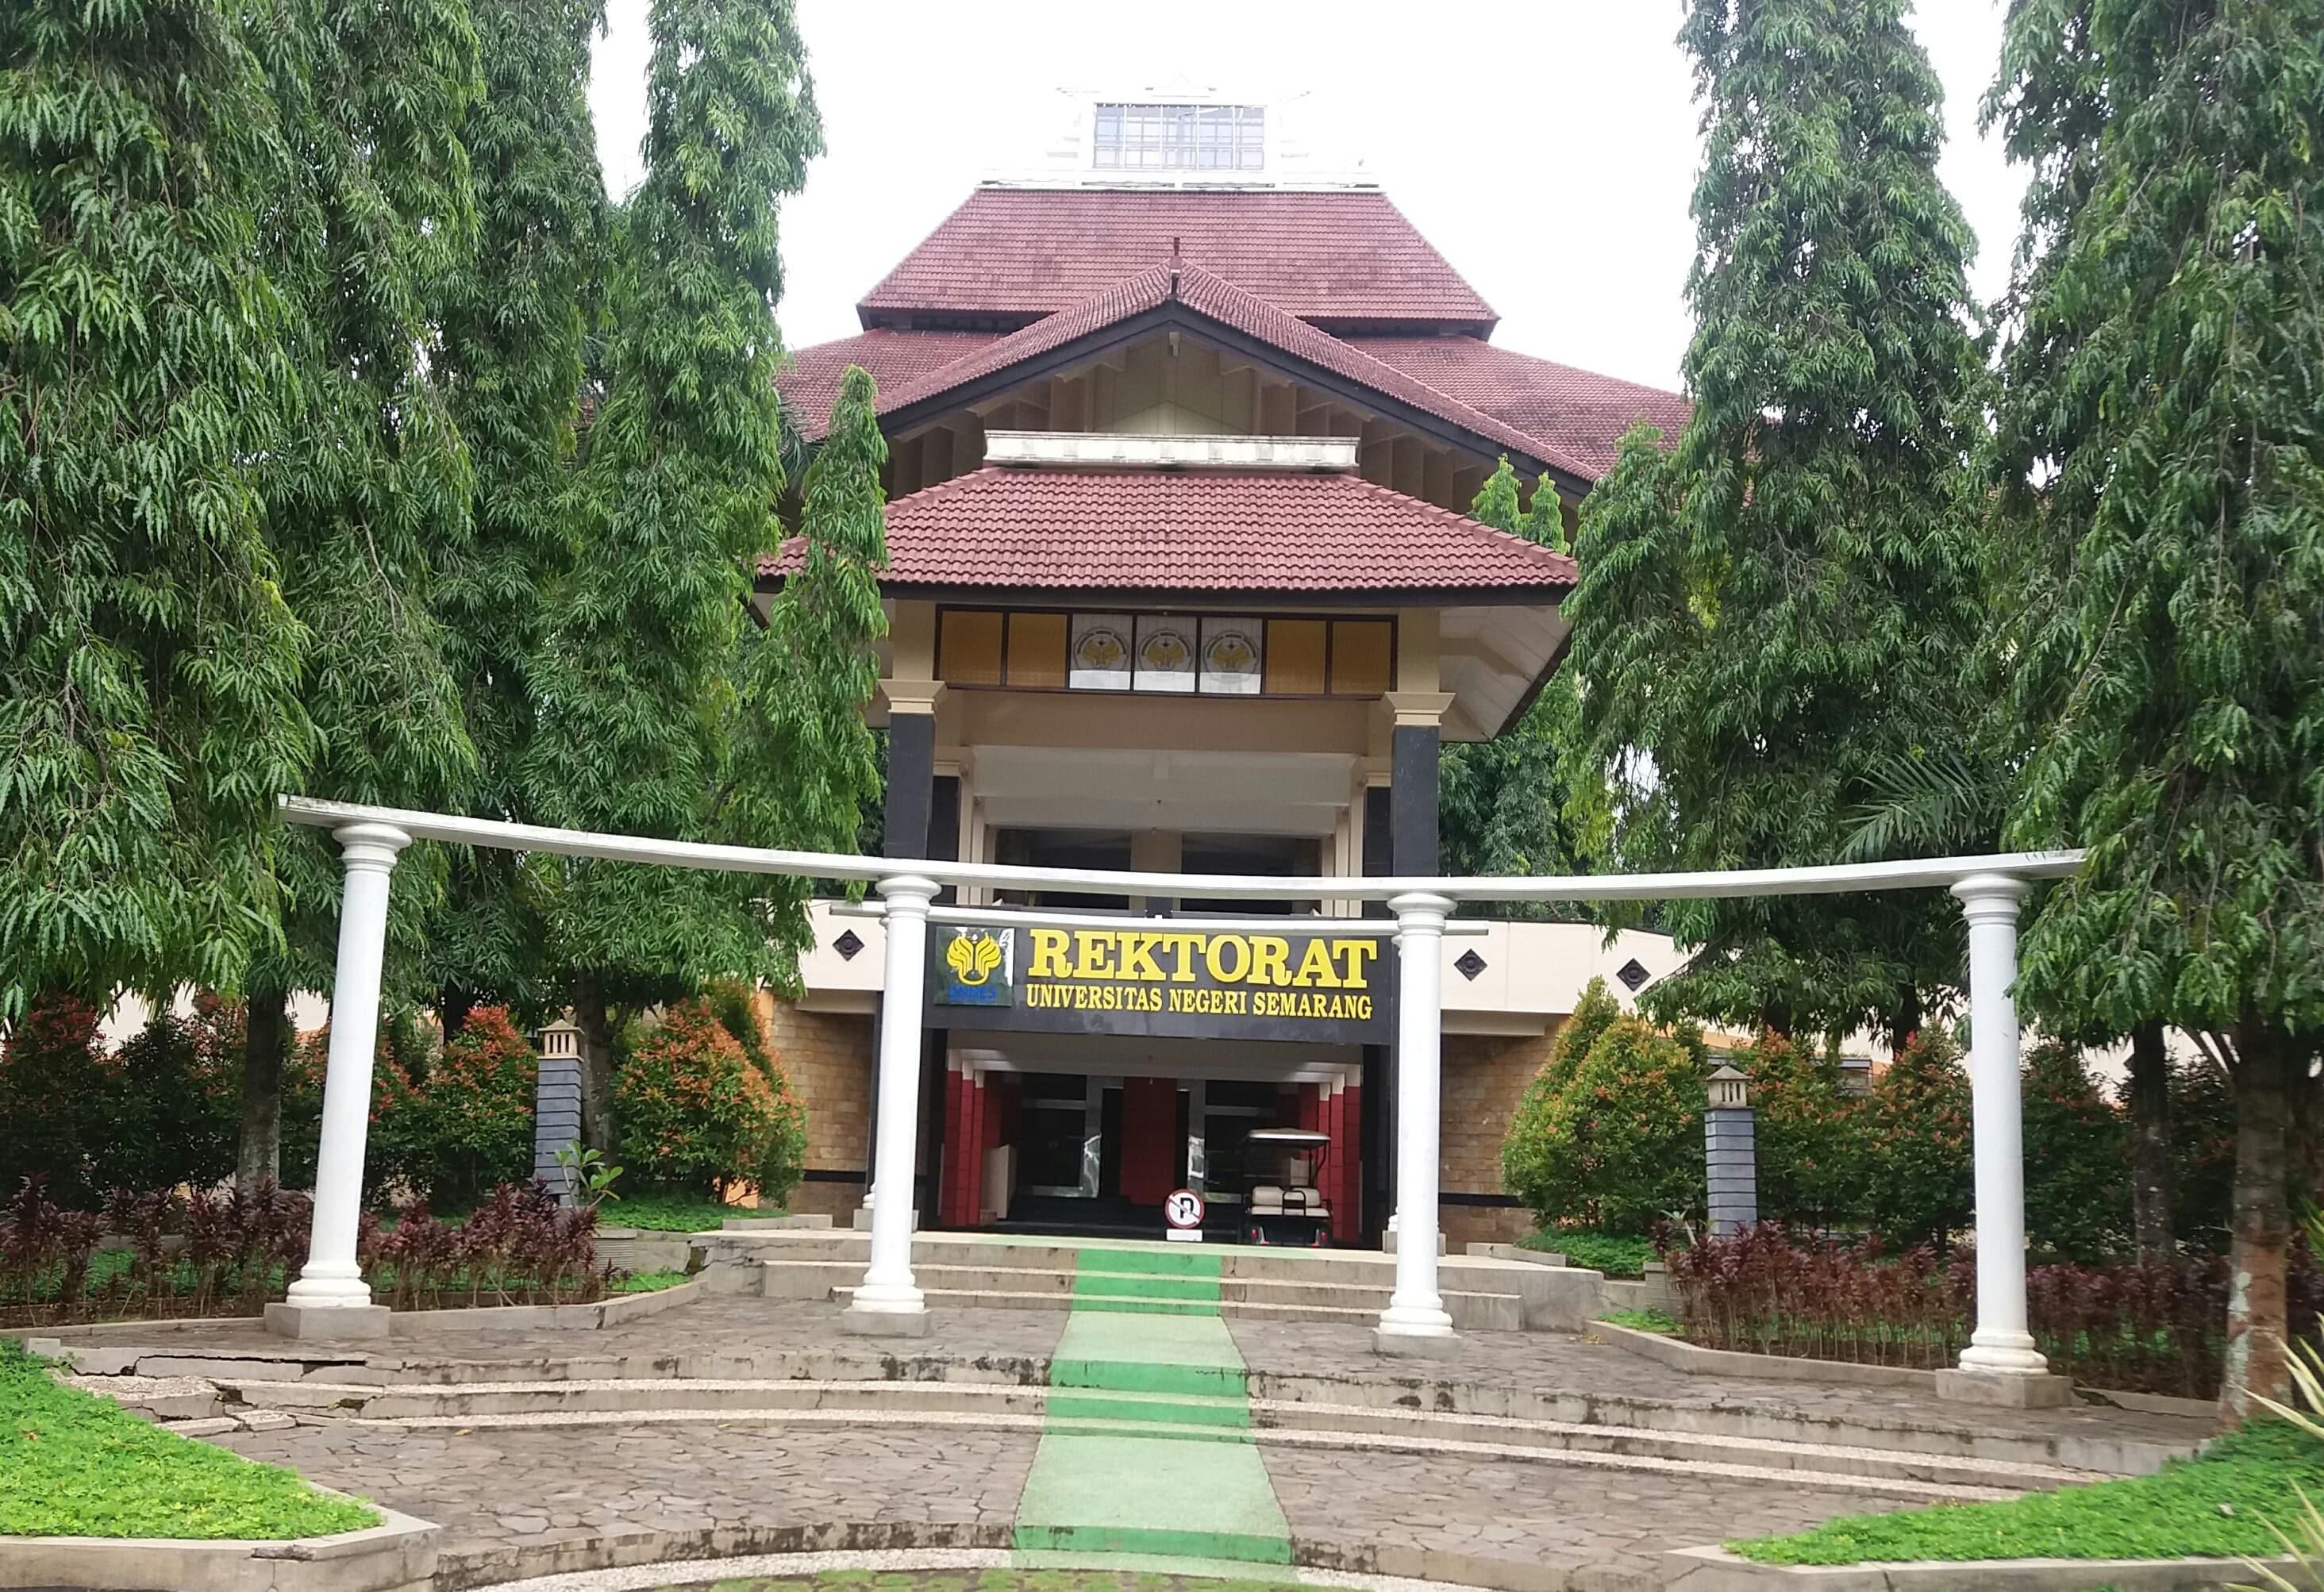 Dengan demikian mulai tahun 2000, jurusan matematika memiliki 3 (tiga) prodi. Sebelum Kuliah Di Universitas Negeri Semarang Kamu Harus Kenali Dulu Program Studinya